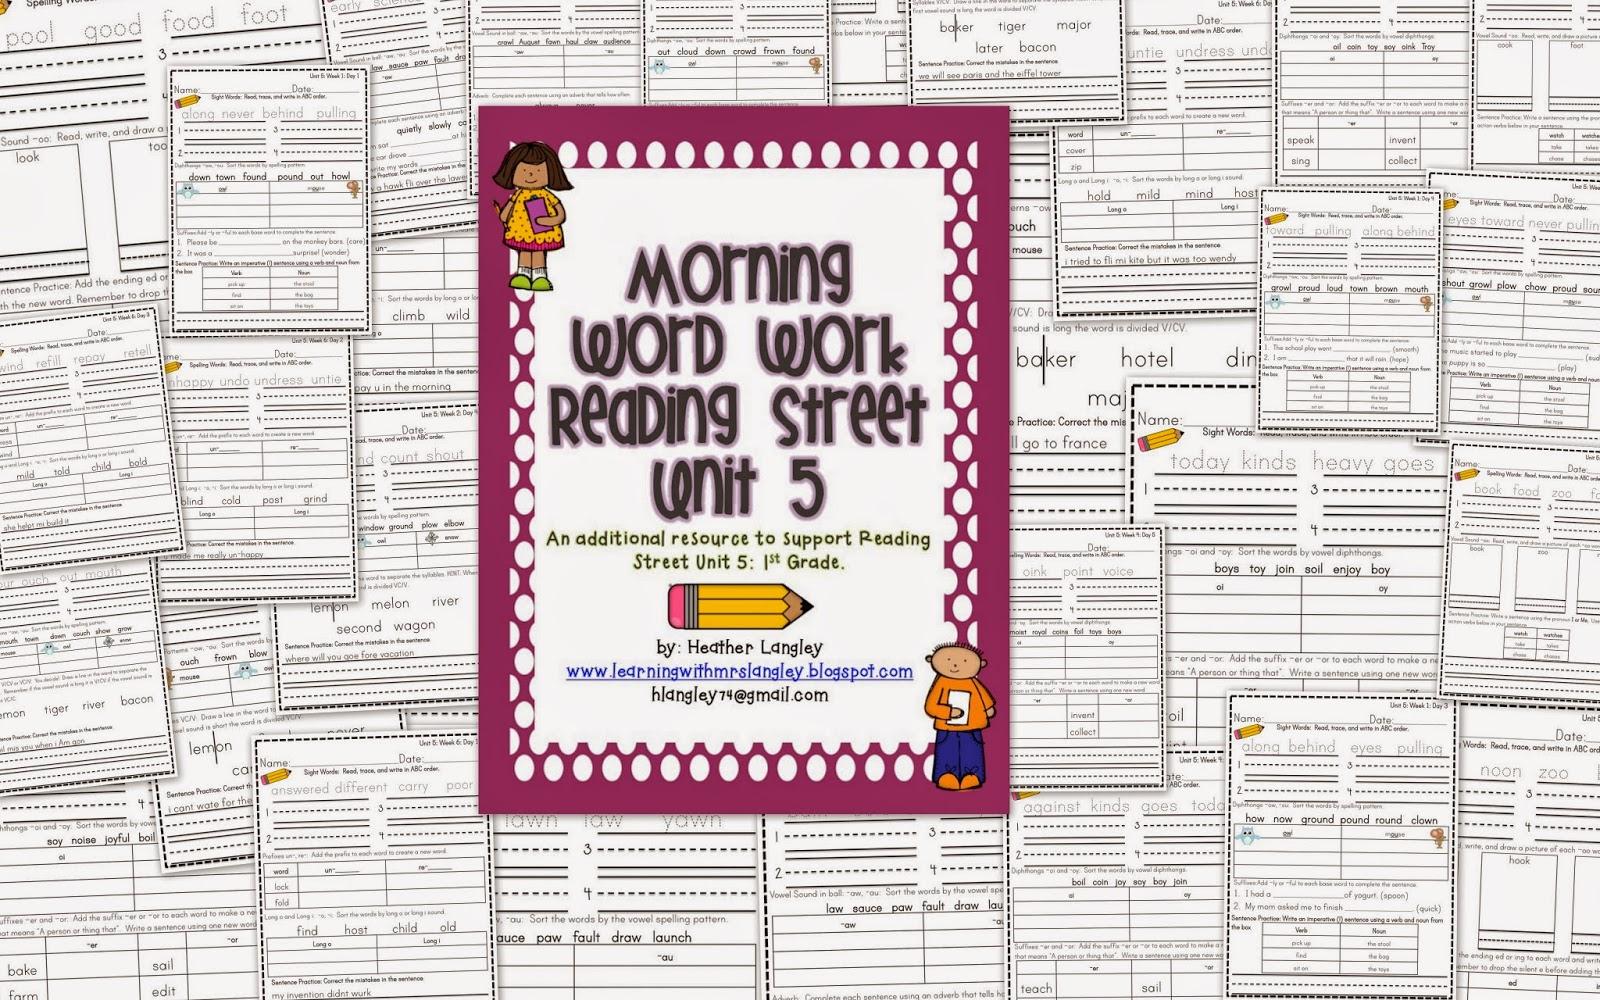 http://www.teacherspayteachers.com/Product/Reading-Street-Morning-Word-Work-BUNDLE-UNITS-R-1-2-3-4-5-1055481